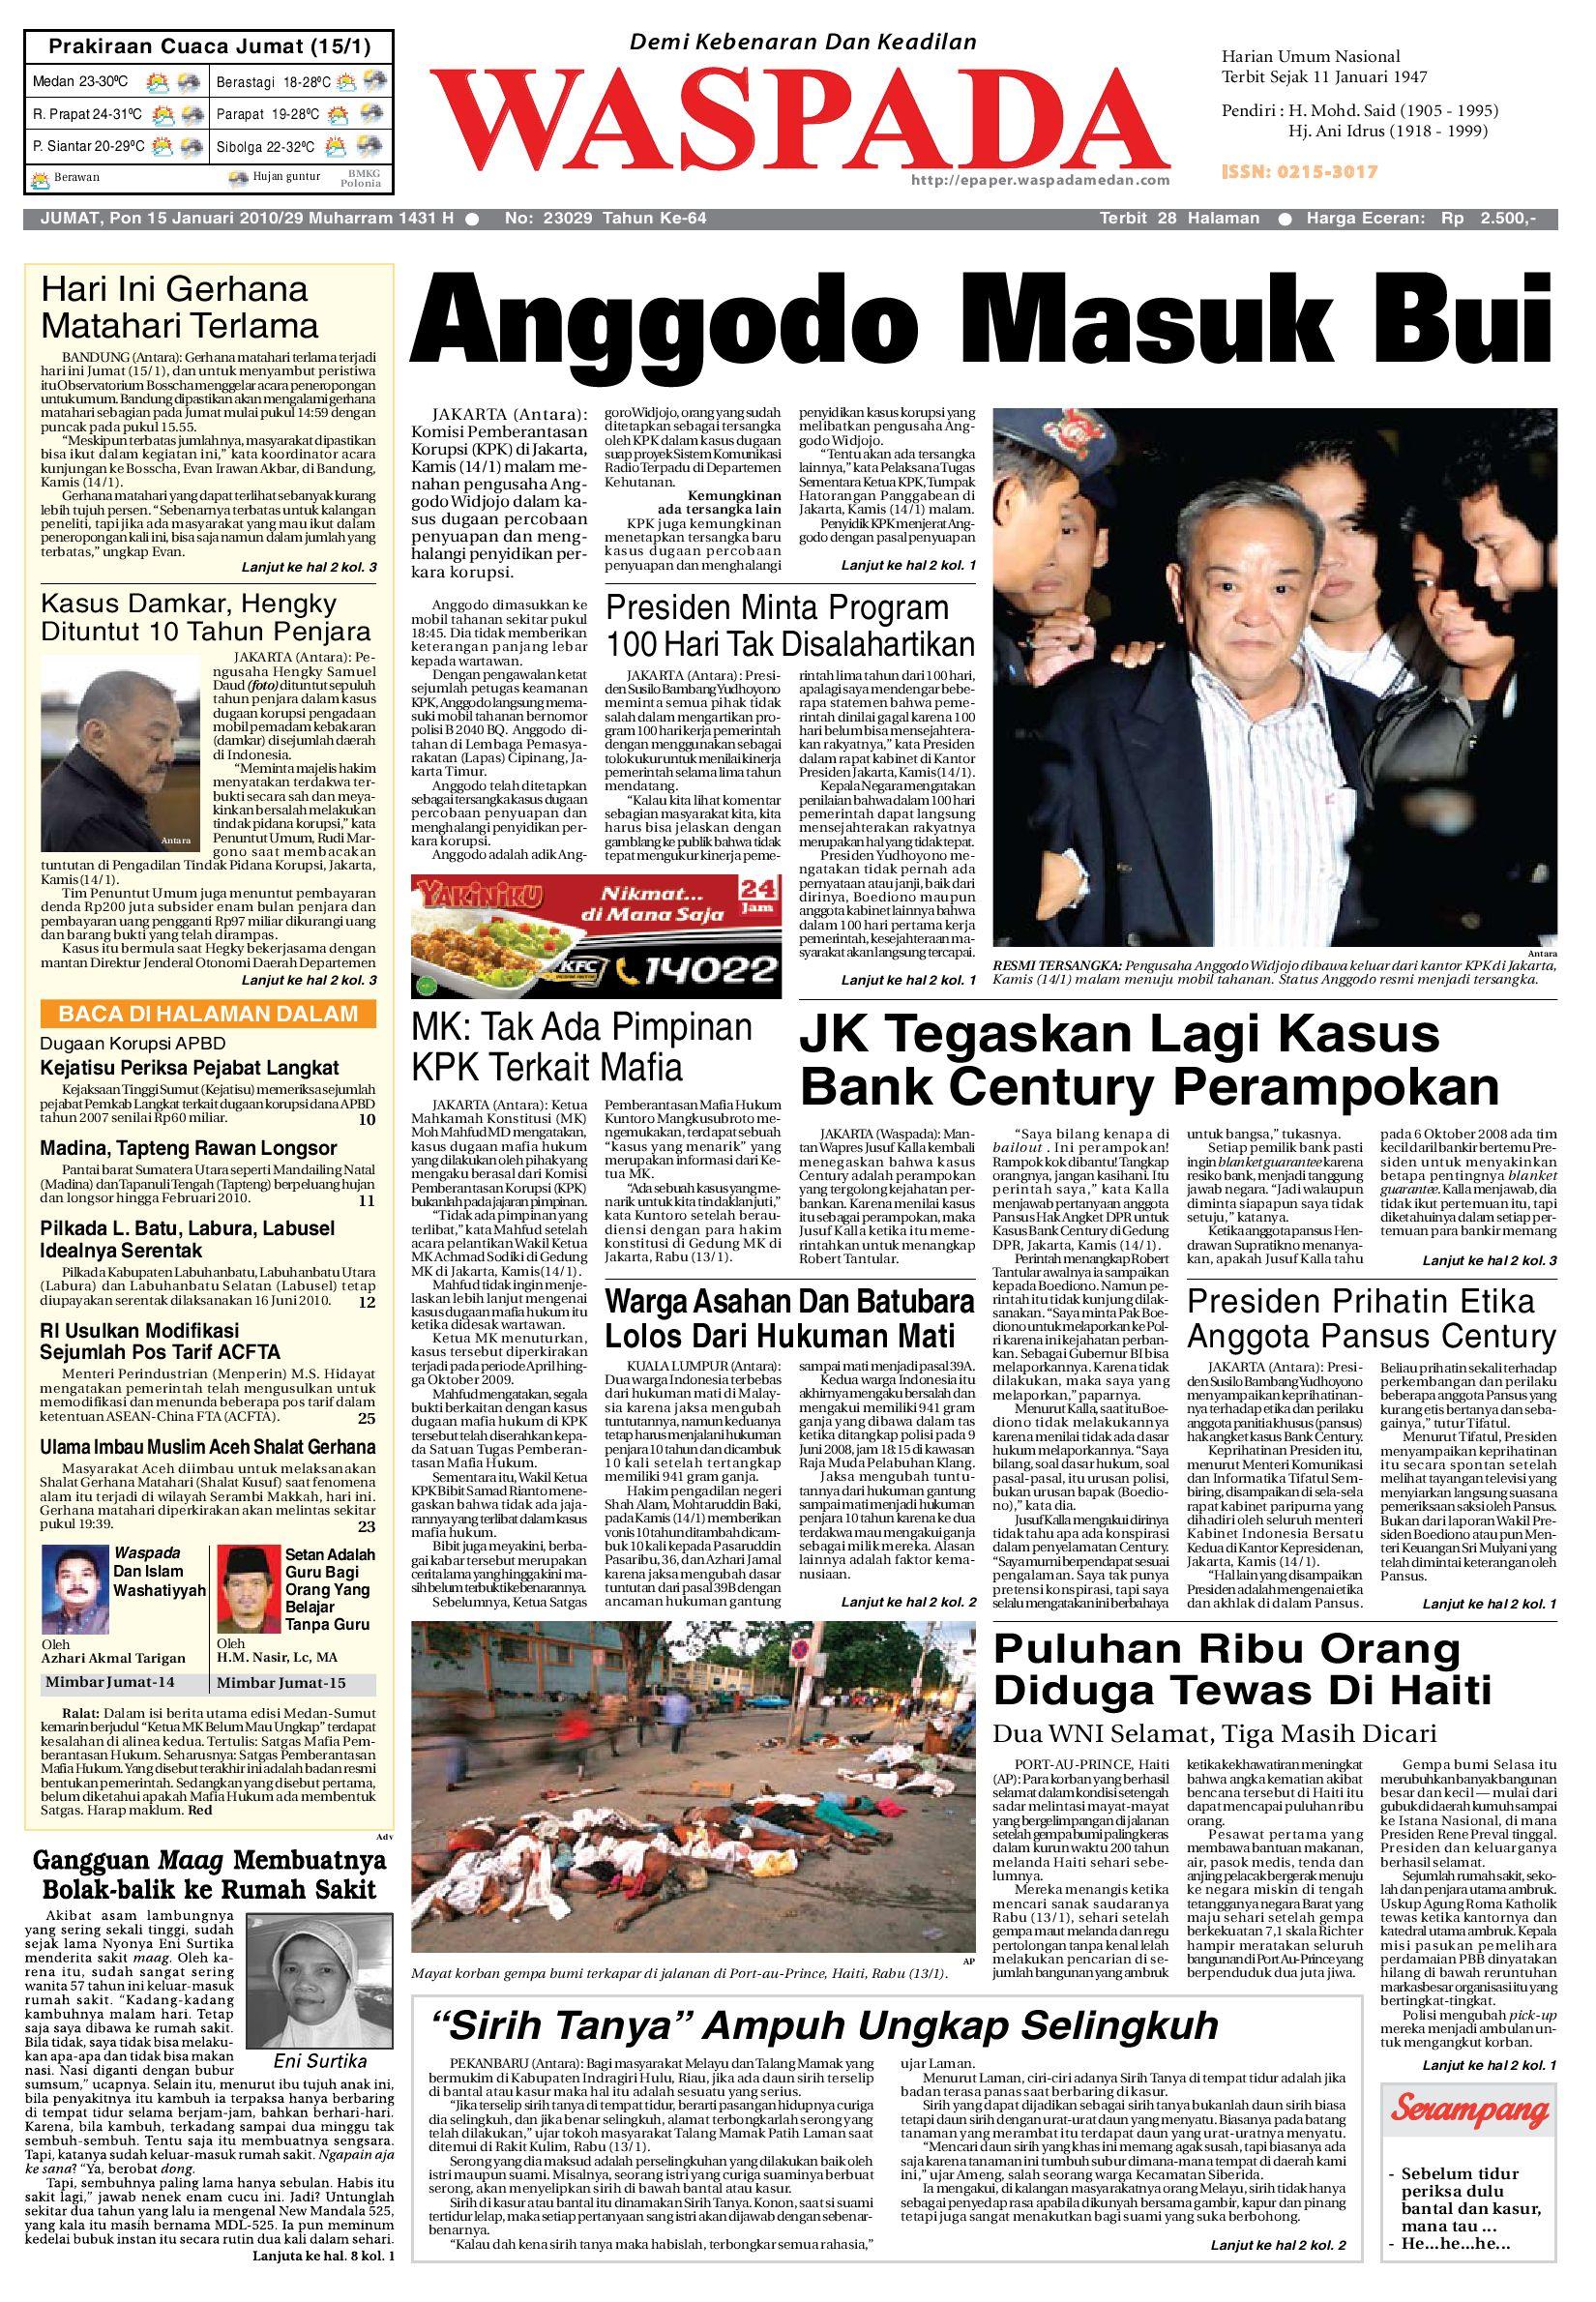 Waspada, Jumat 10 Januari 10 by Harian Waspada   issuu